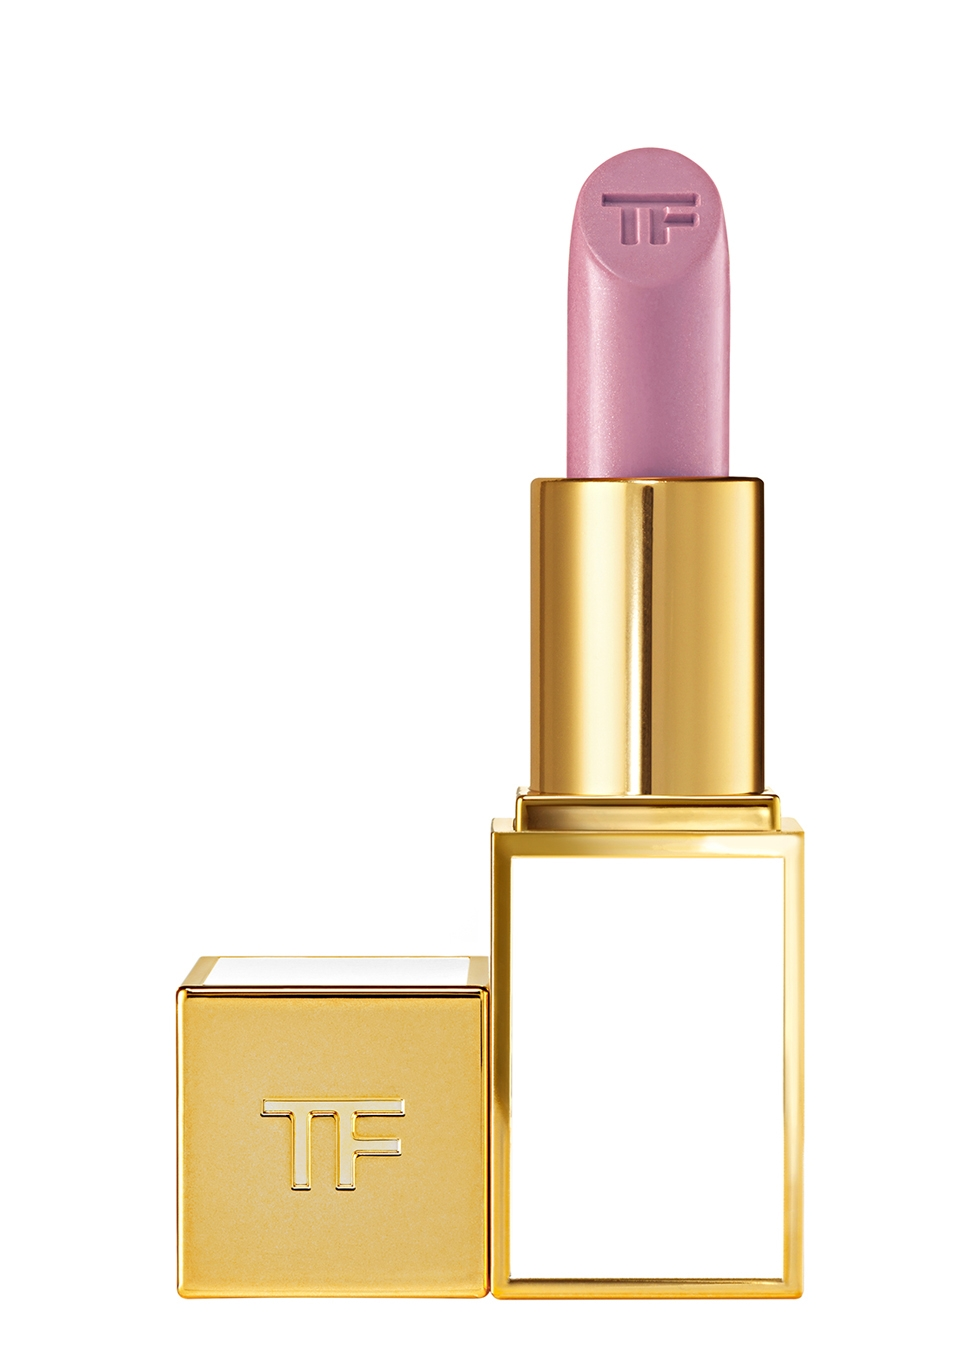 Ultra Rich Lip Colour - Tom Ford